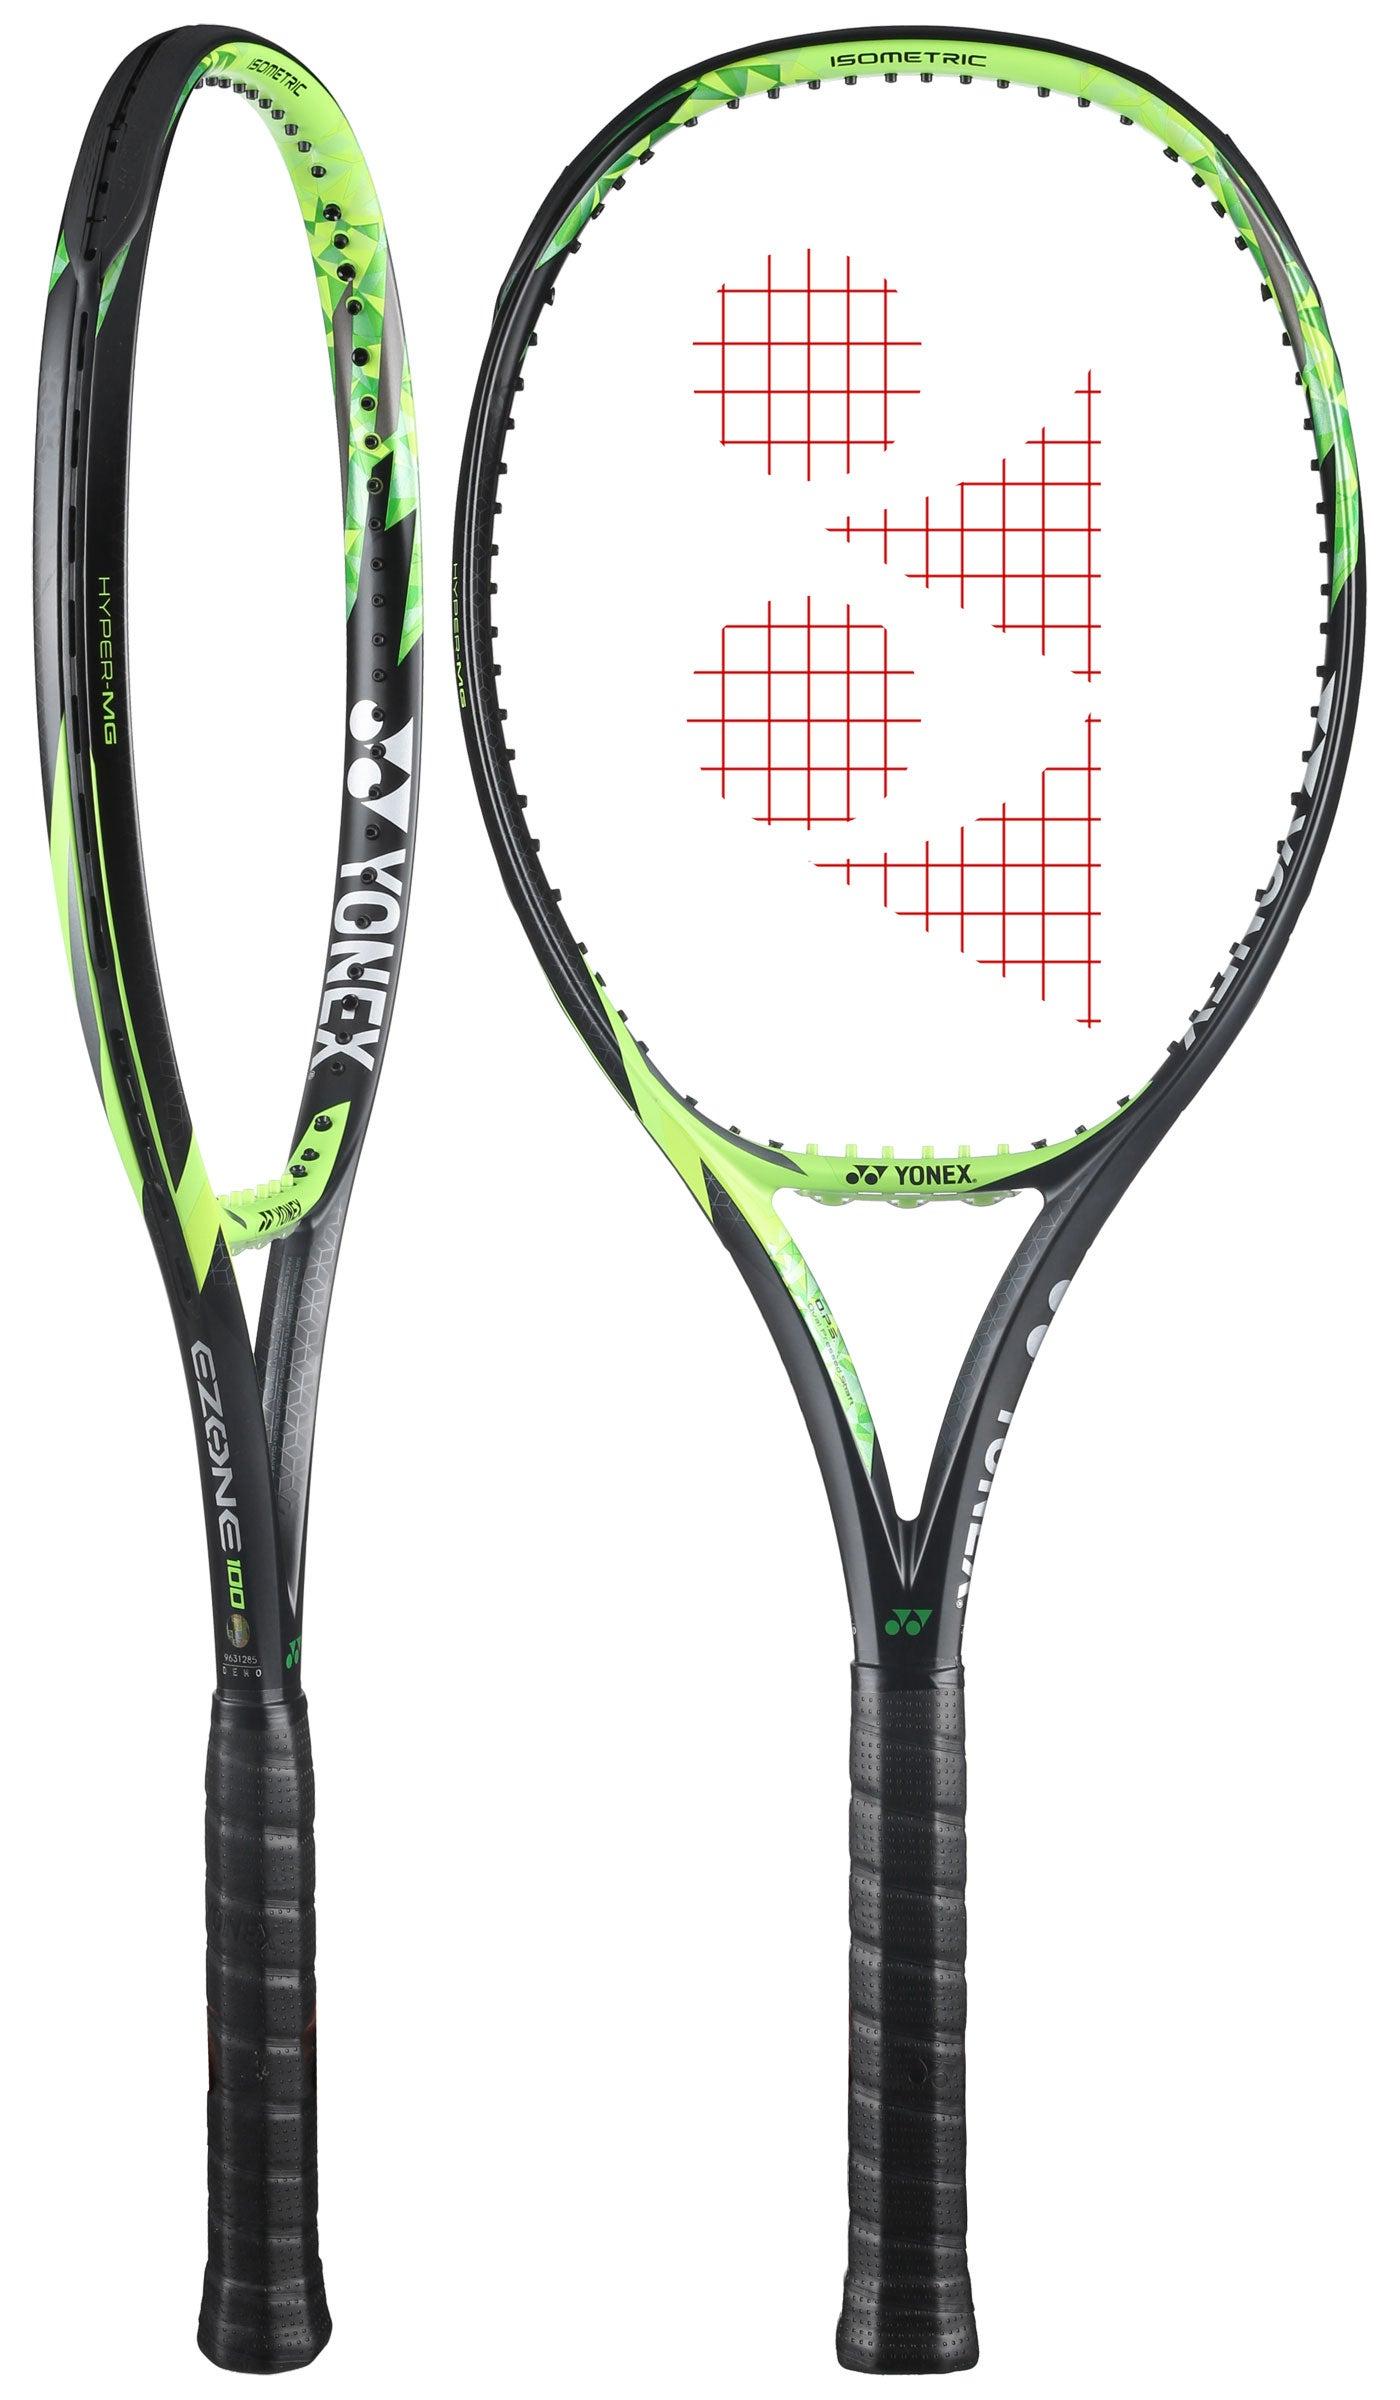 Racchetta Yonex EZONE 100 (300g) - Tennis Warehouse Europe